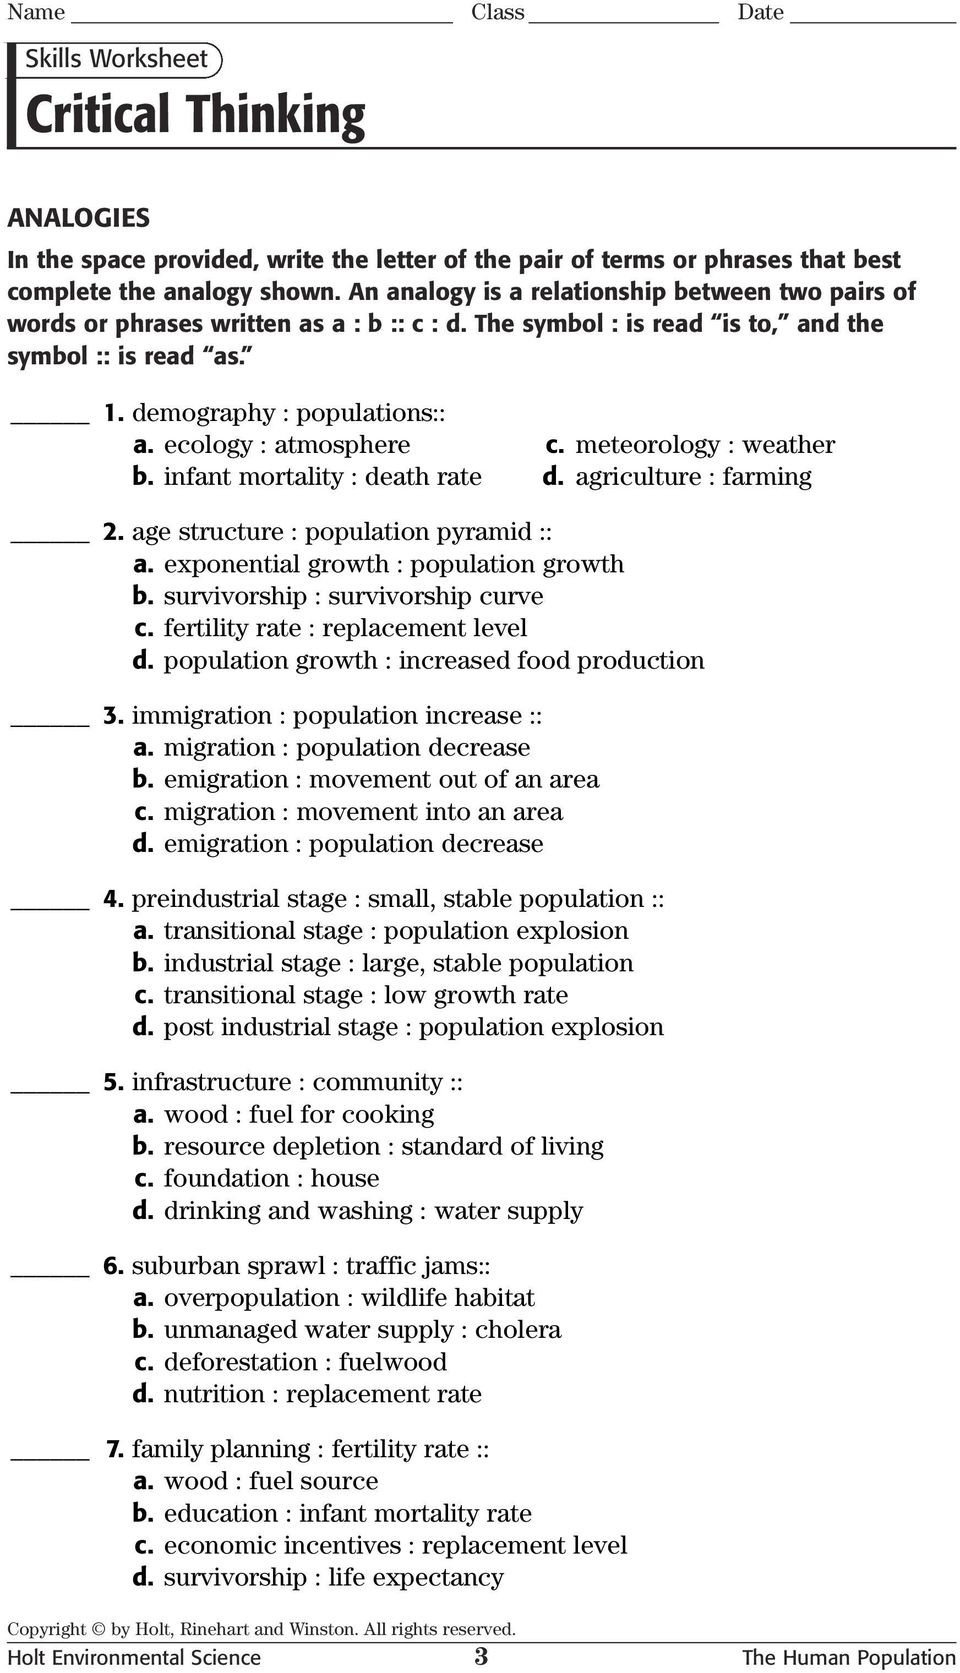 Science Skills Worksheet Answer Key Critical Thinking Analogies Skills Worksheet Pdf Free